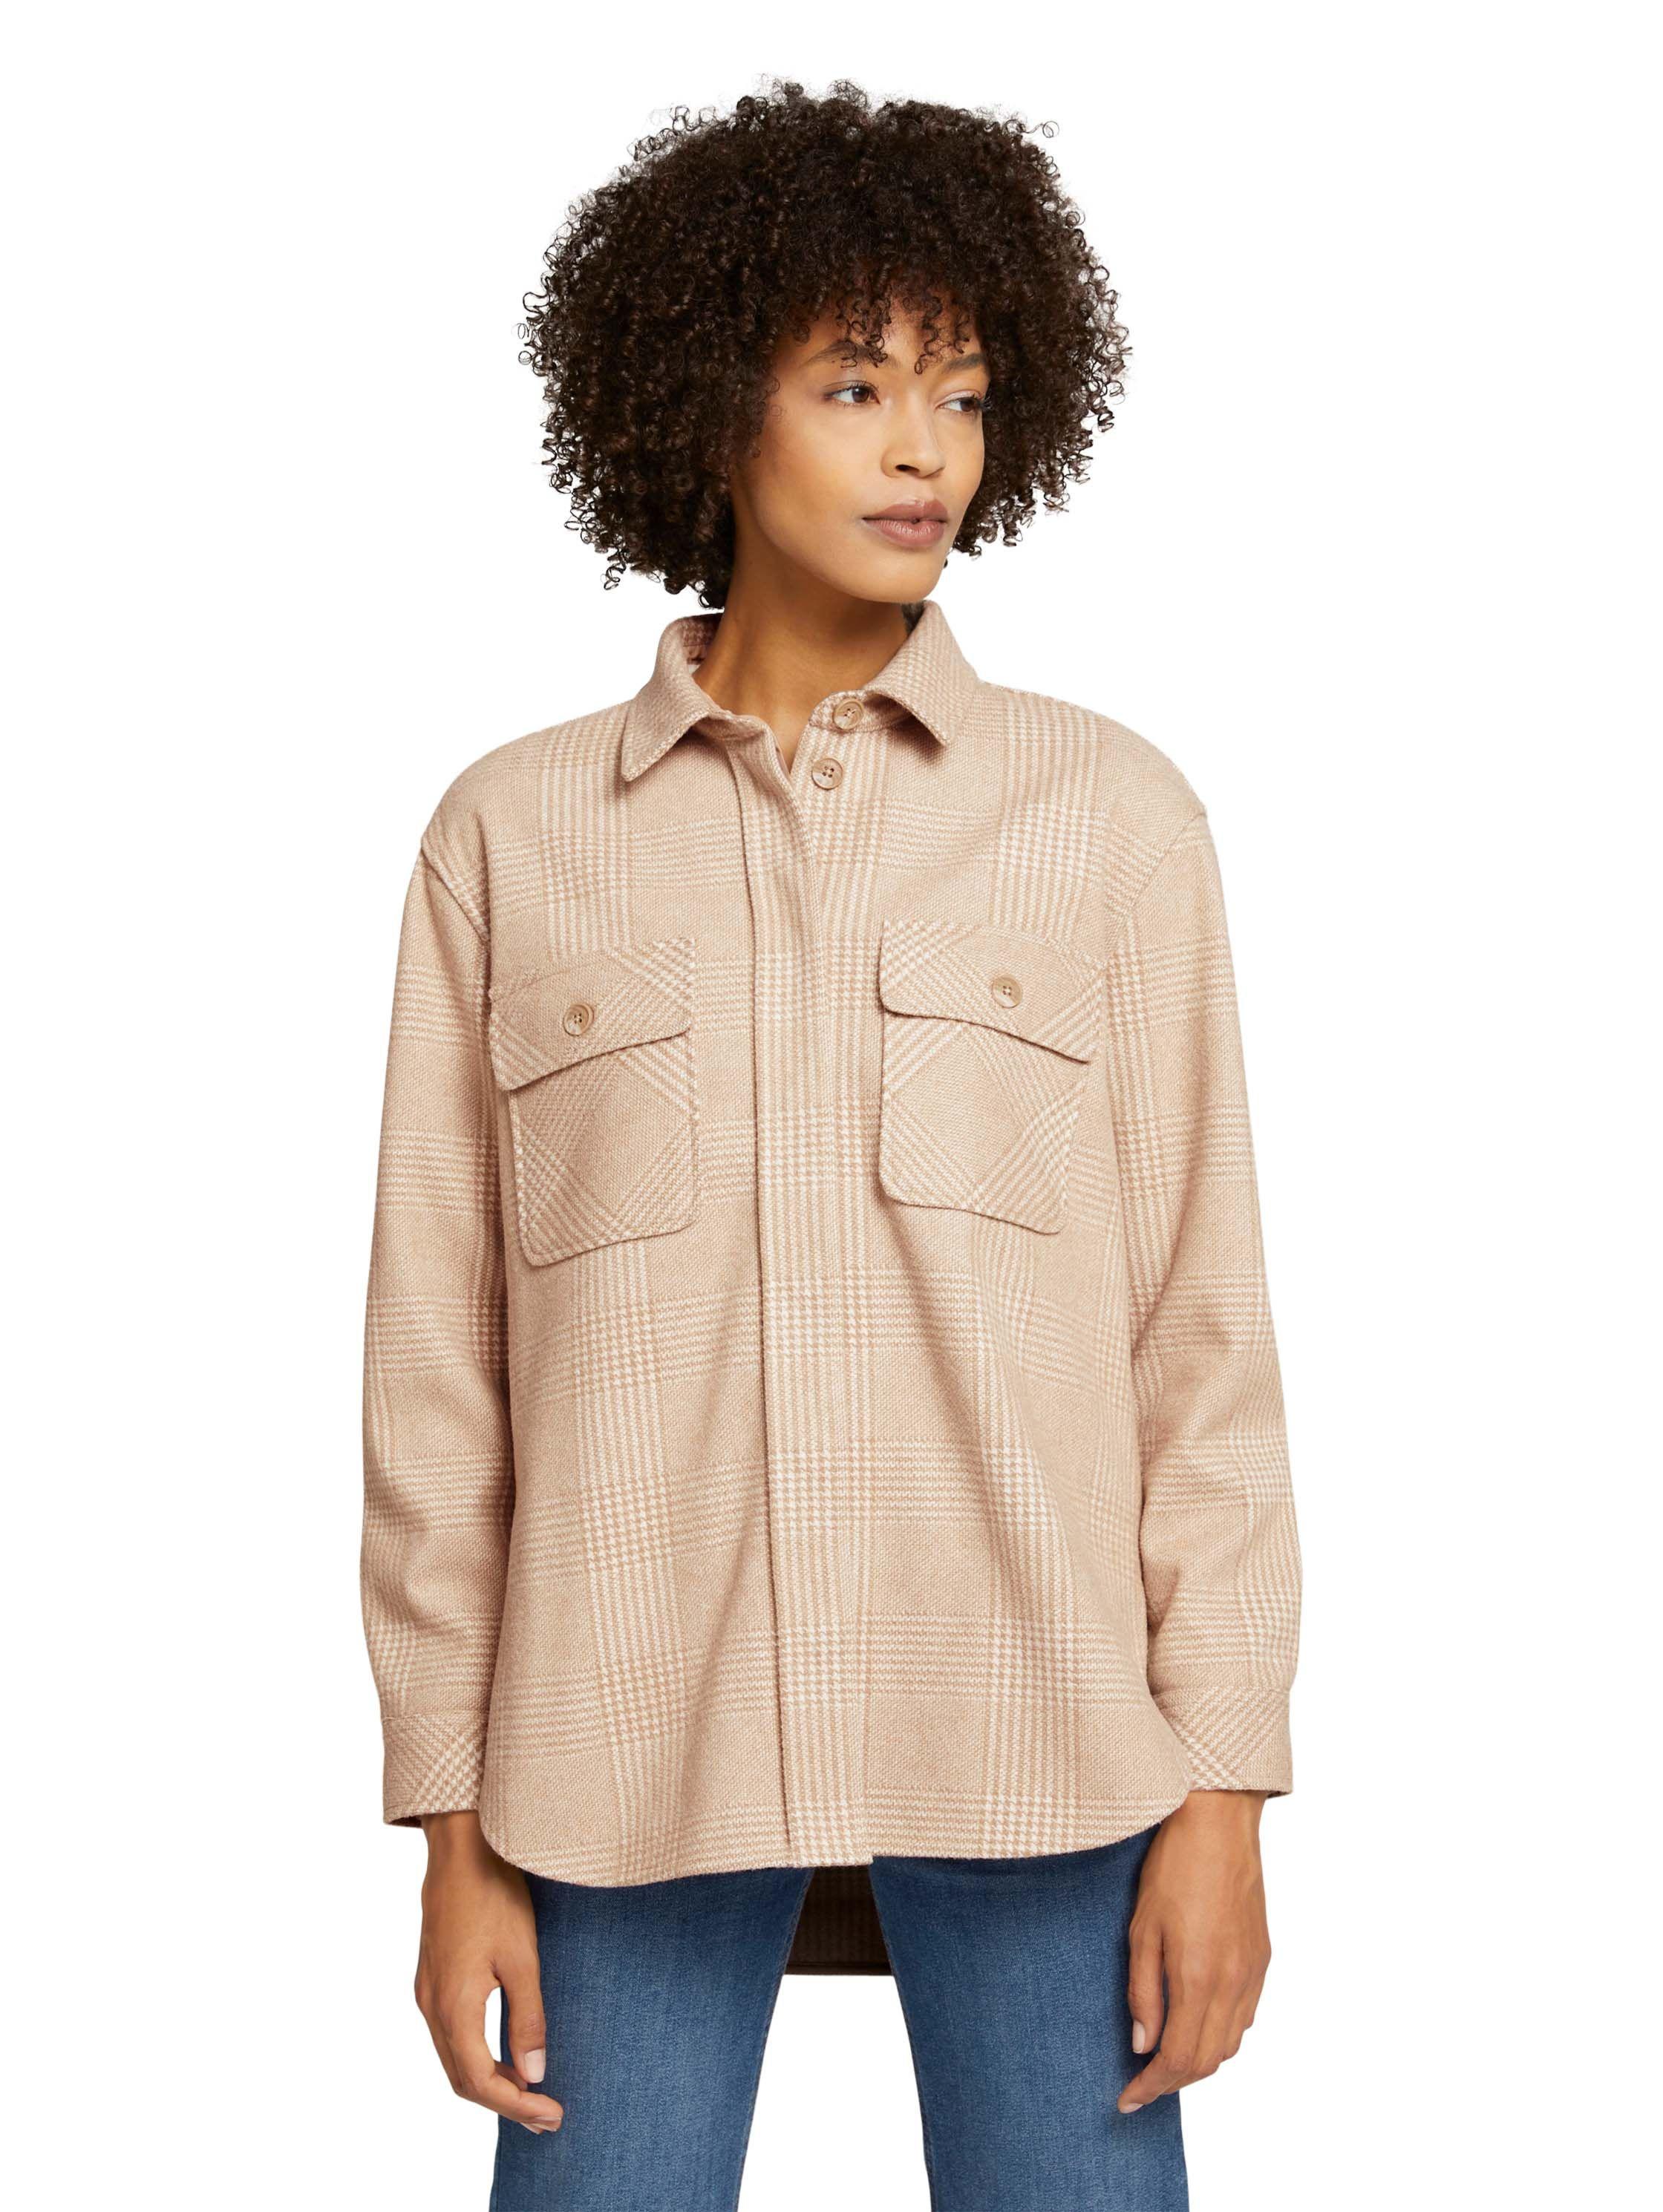 Tom Tailor dames geruit overhemd